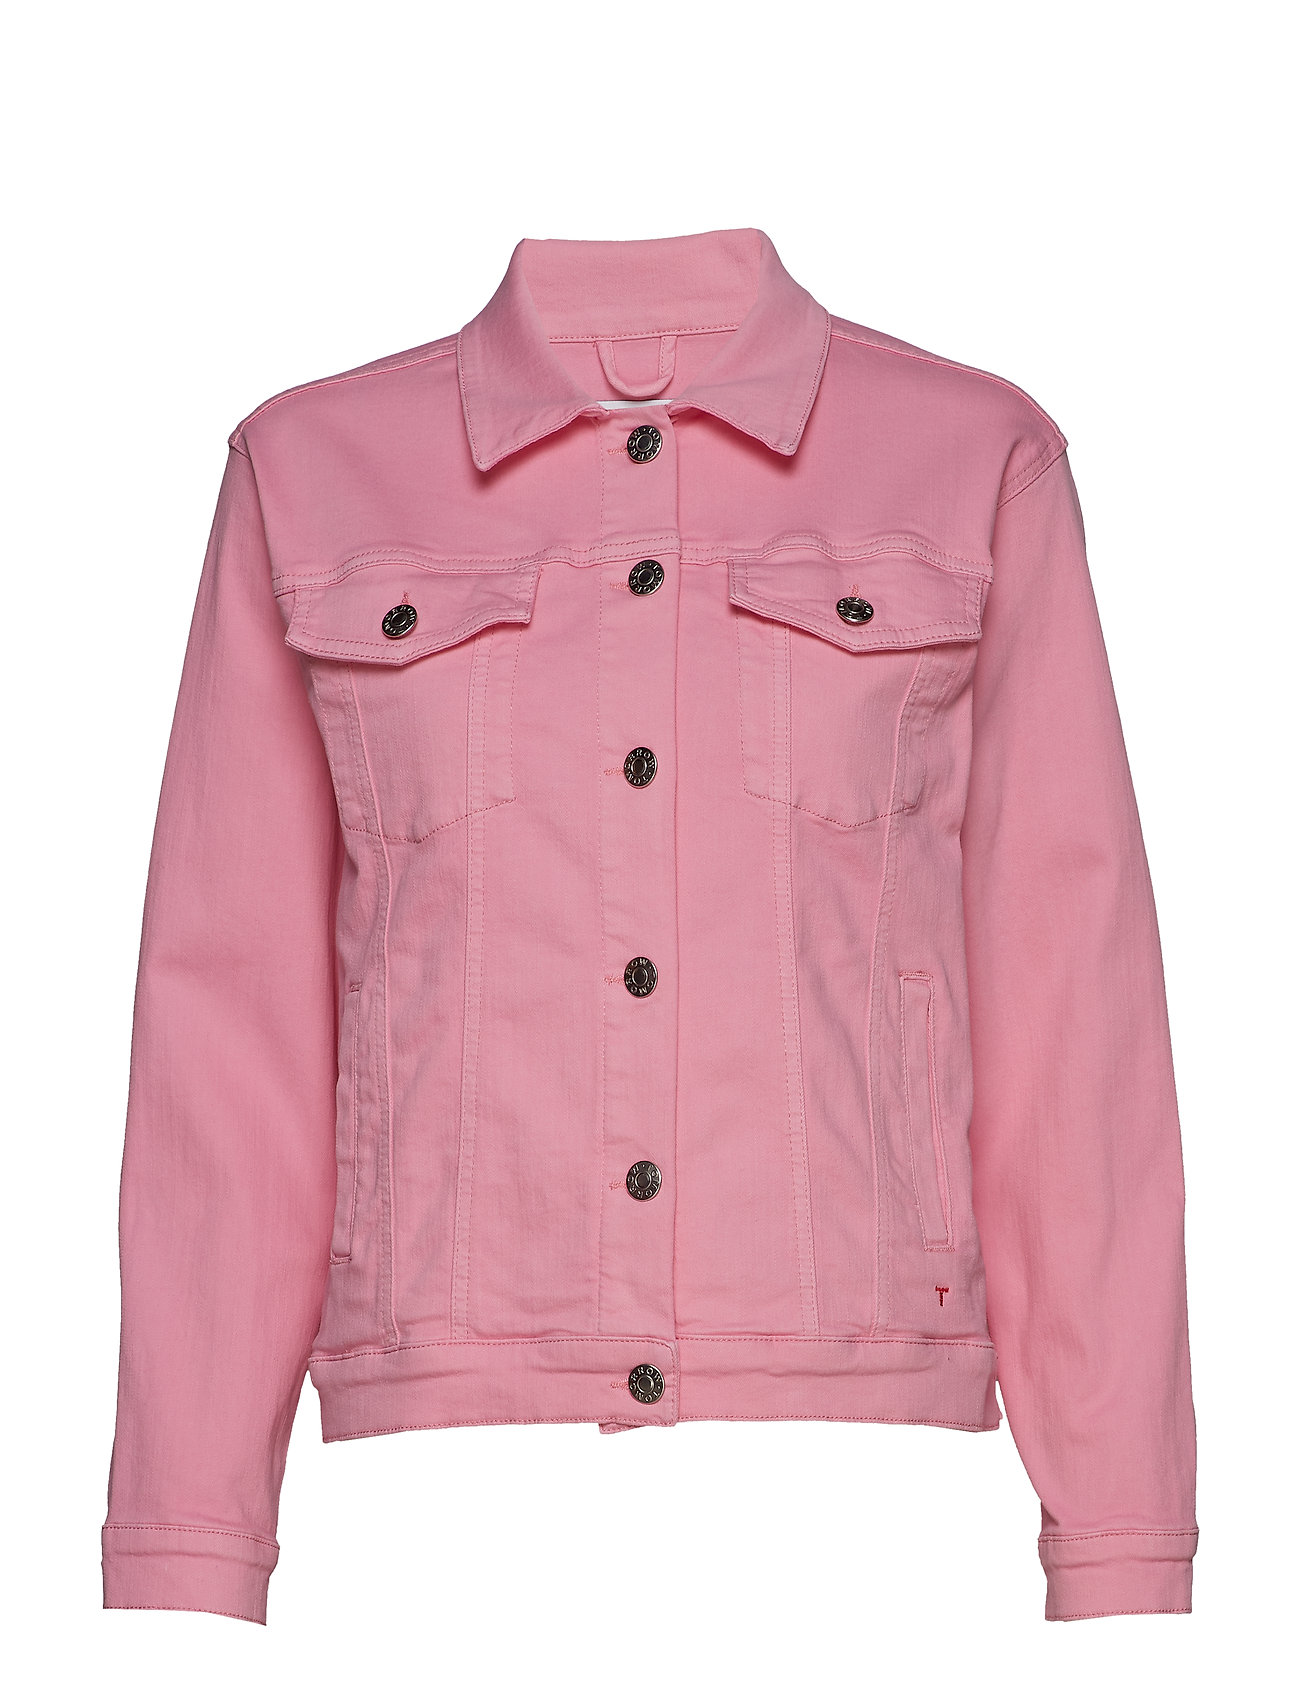 Tomorrow Dylan jacket colour - BLUSH